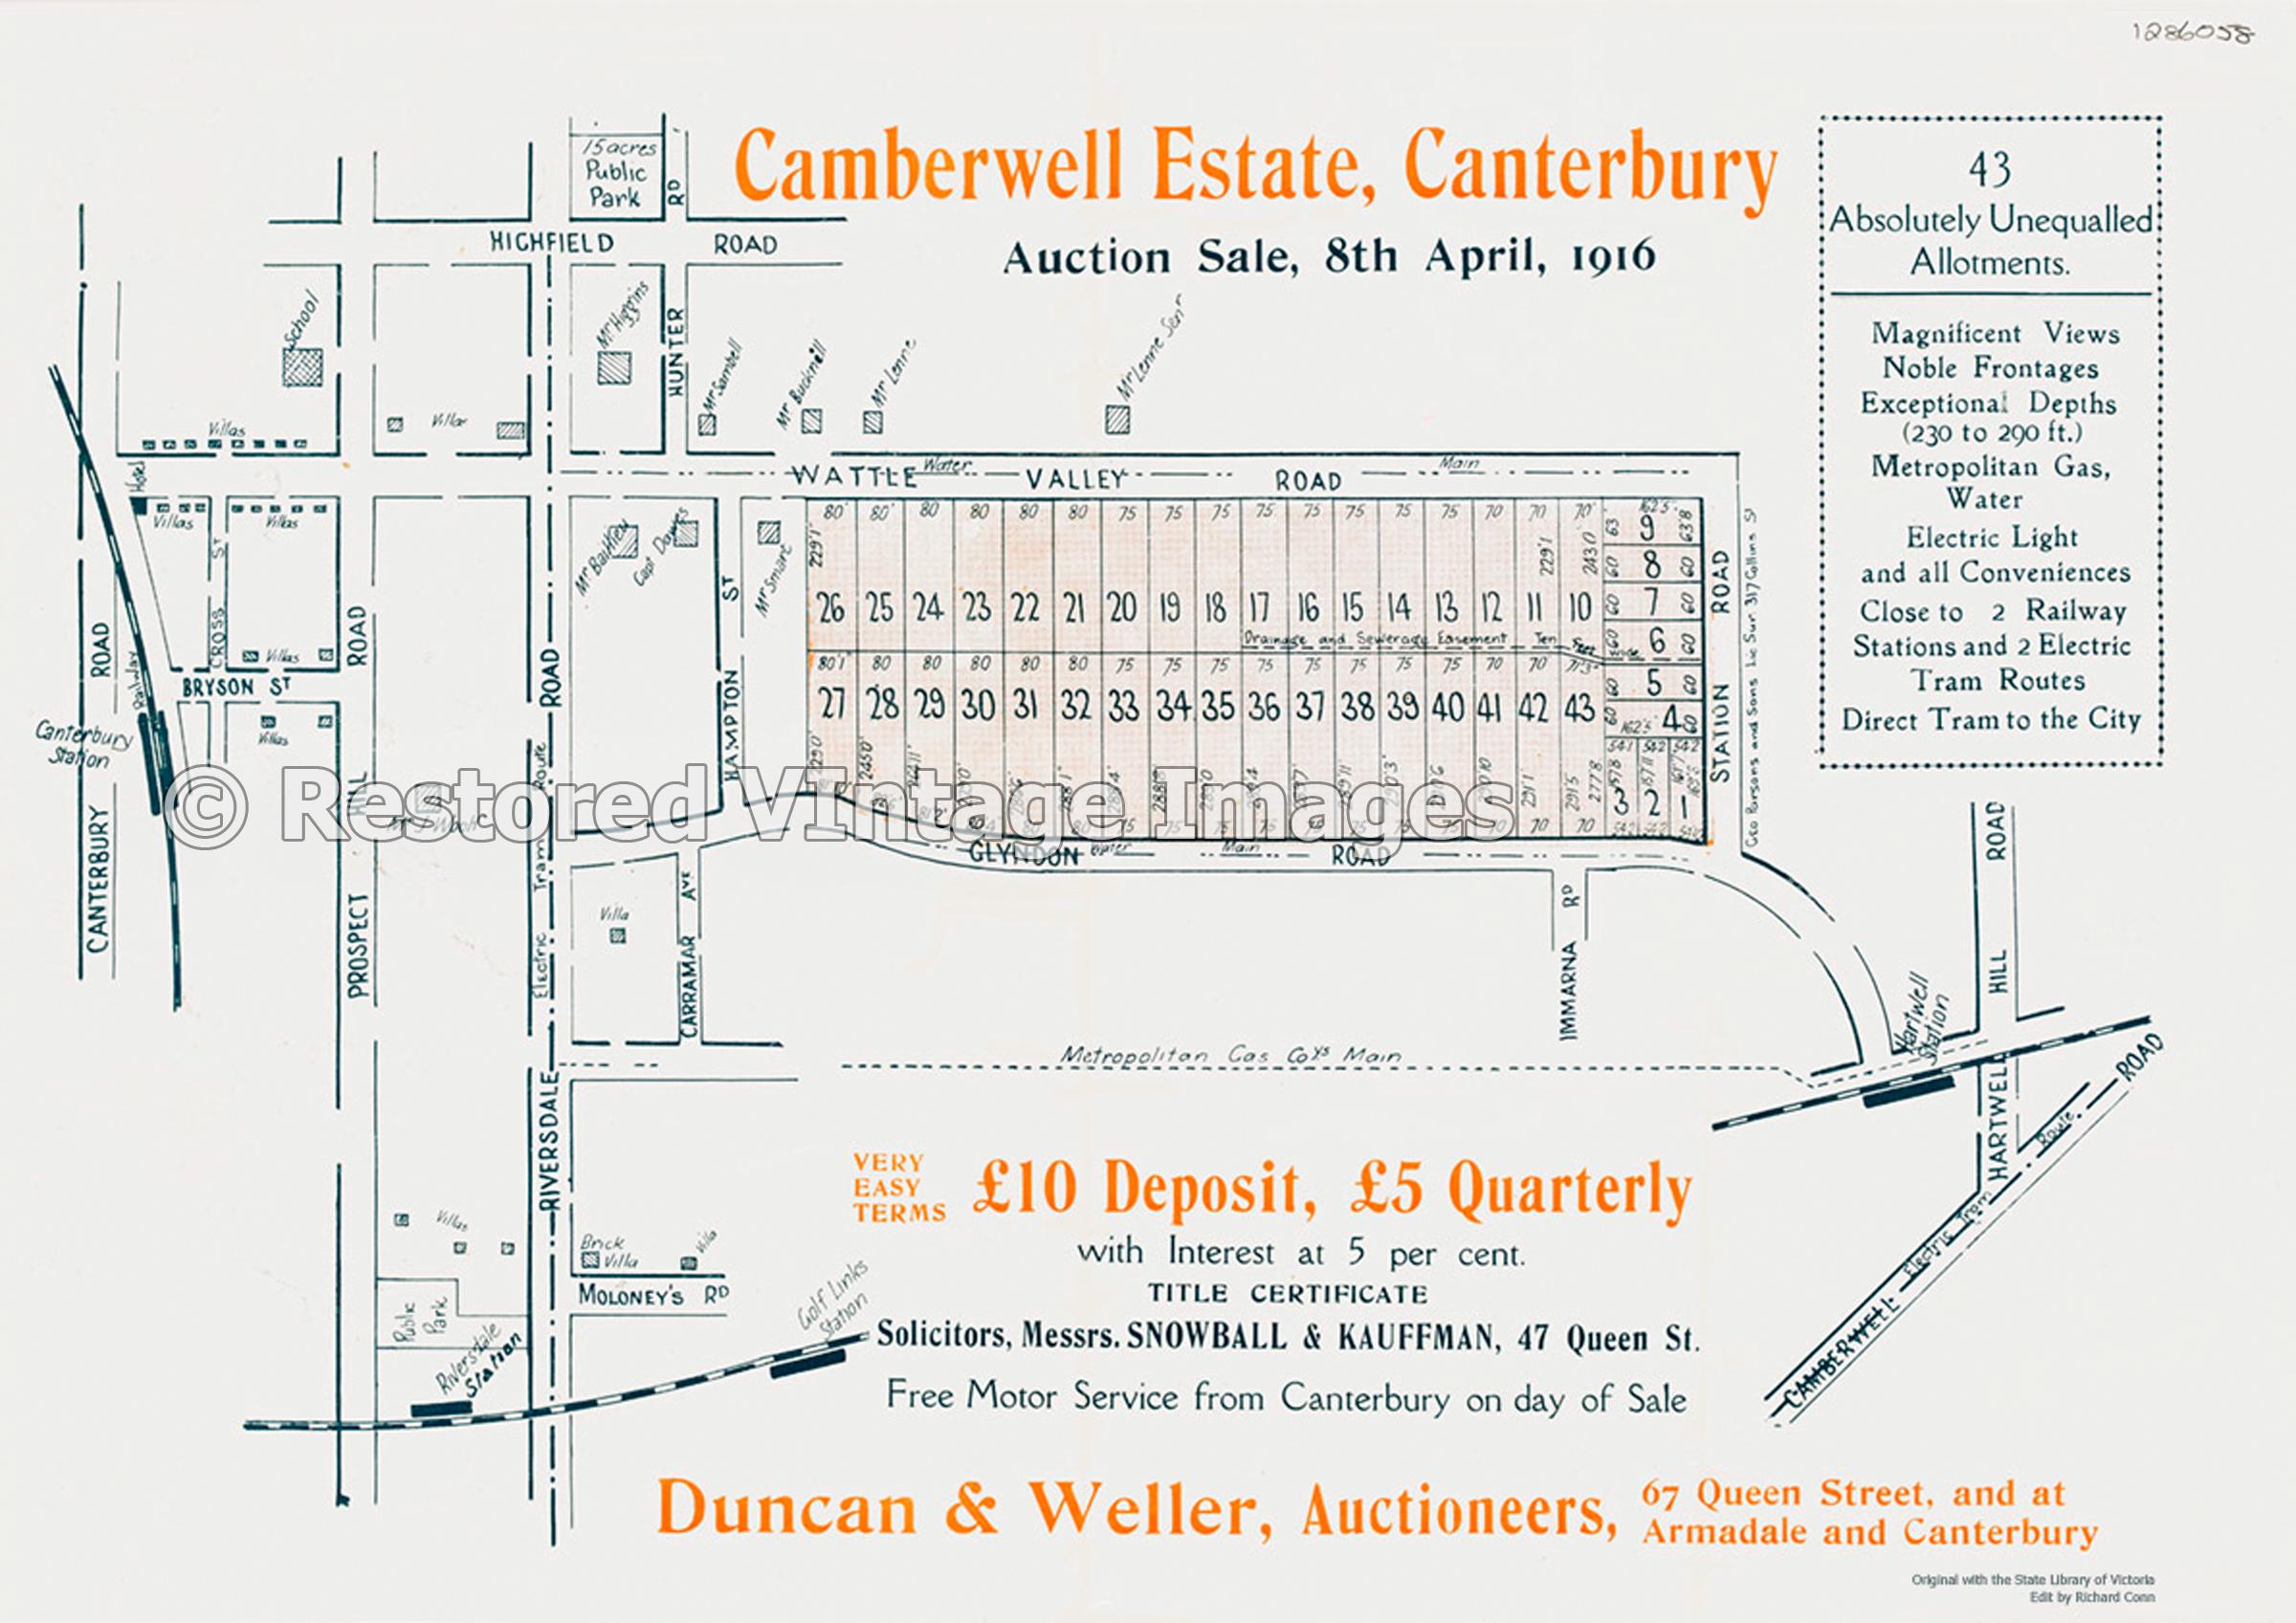 Camberwell Estate, Canterbury